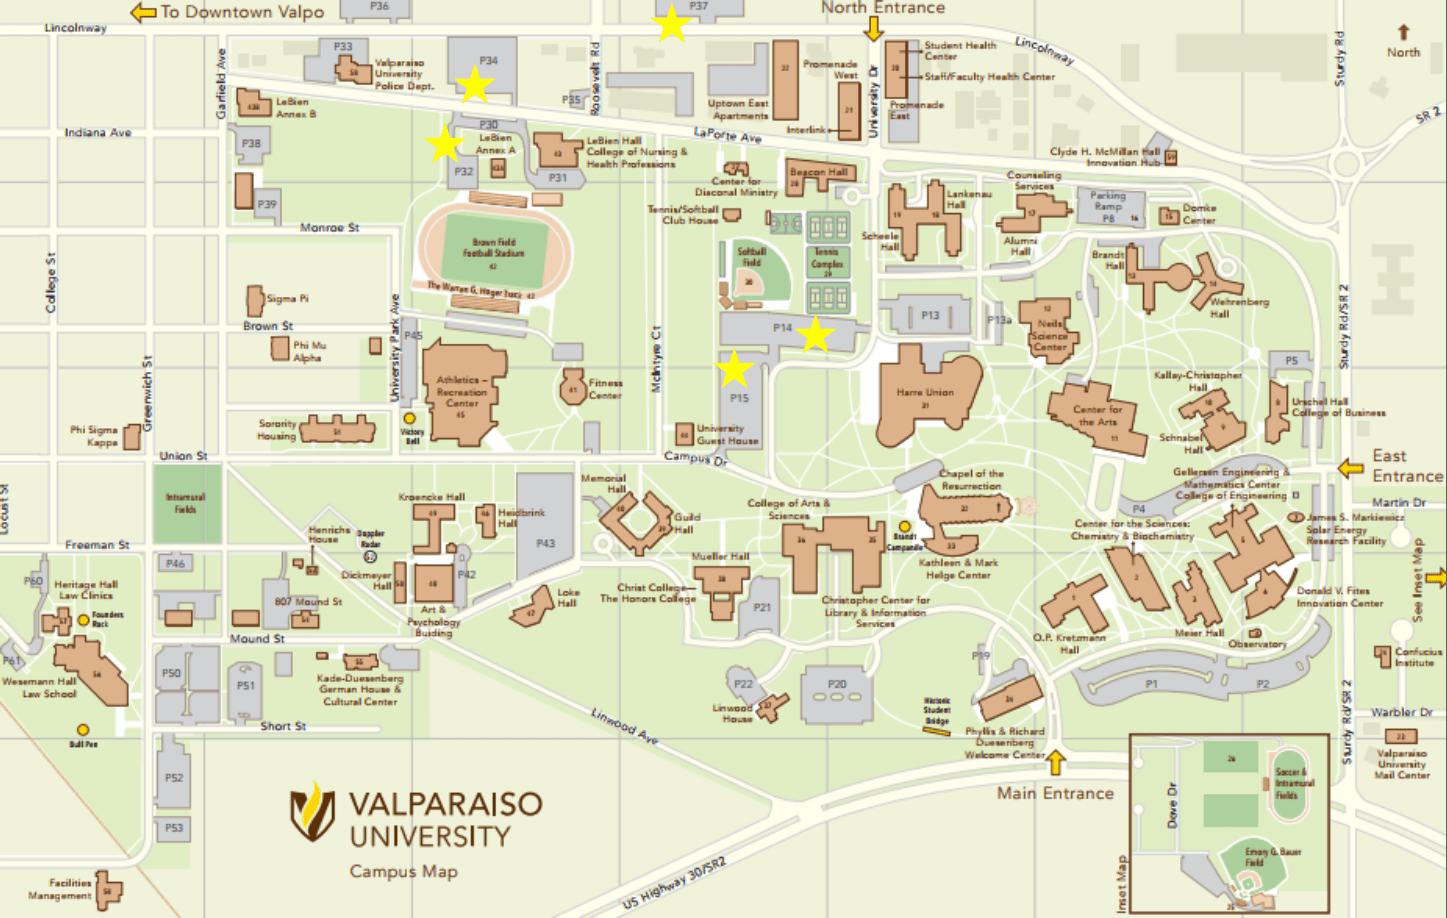 Valparaiso Campus Map.Valparaiso University Campus Map